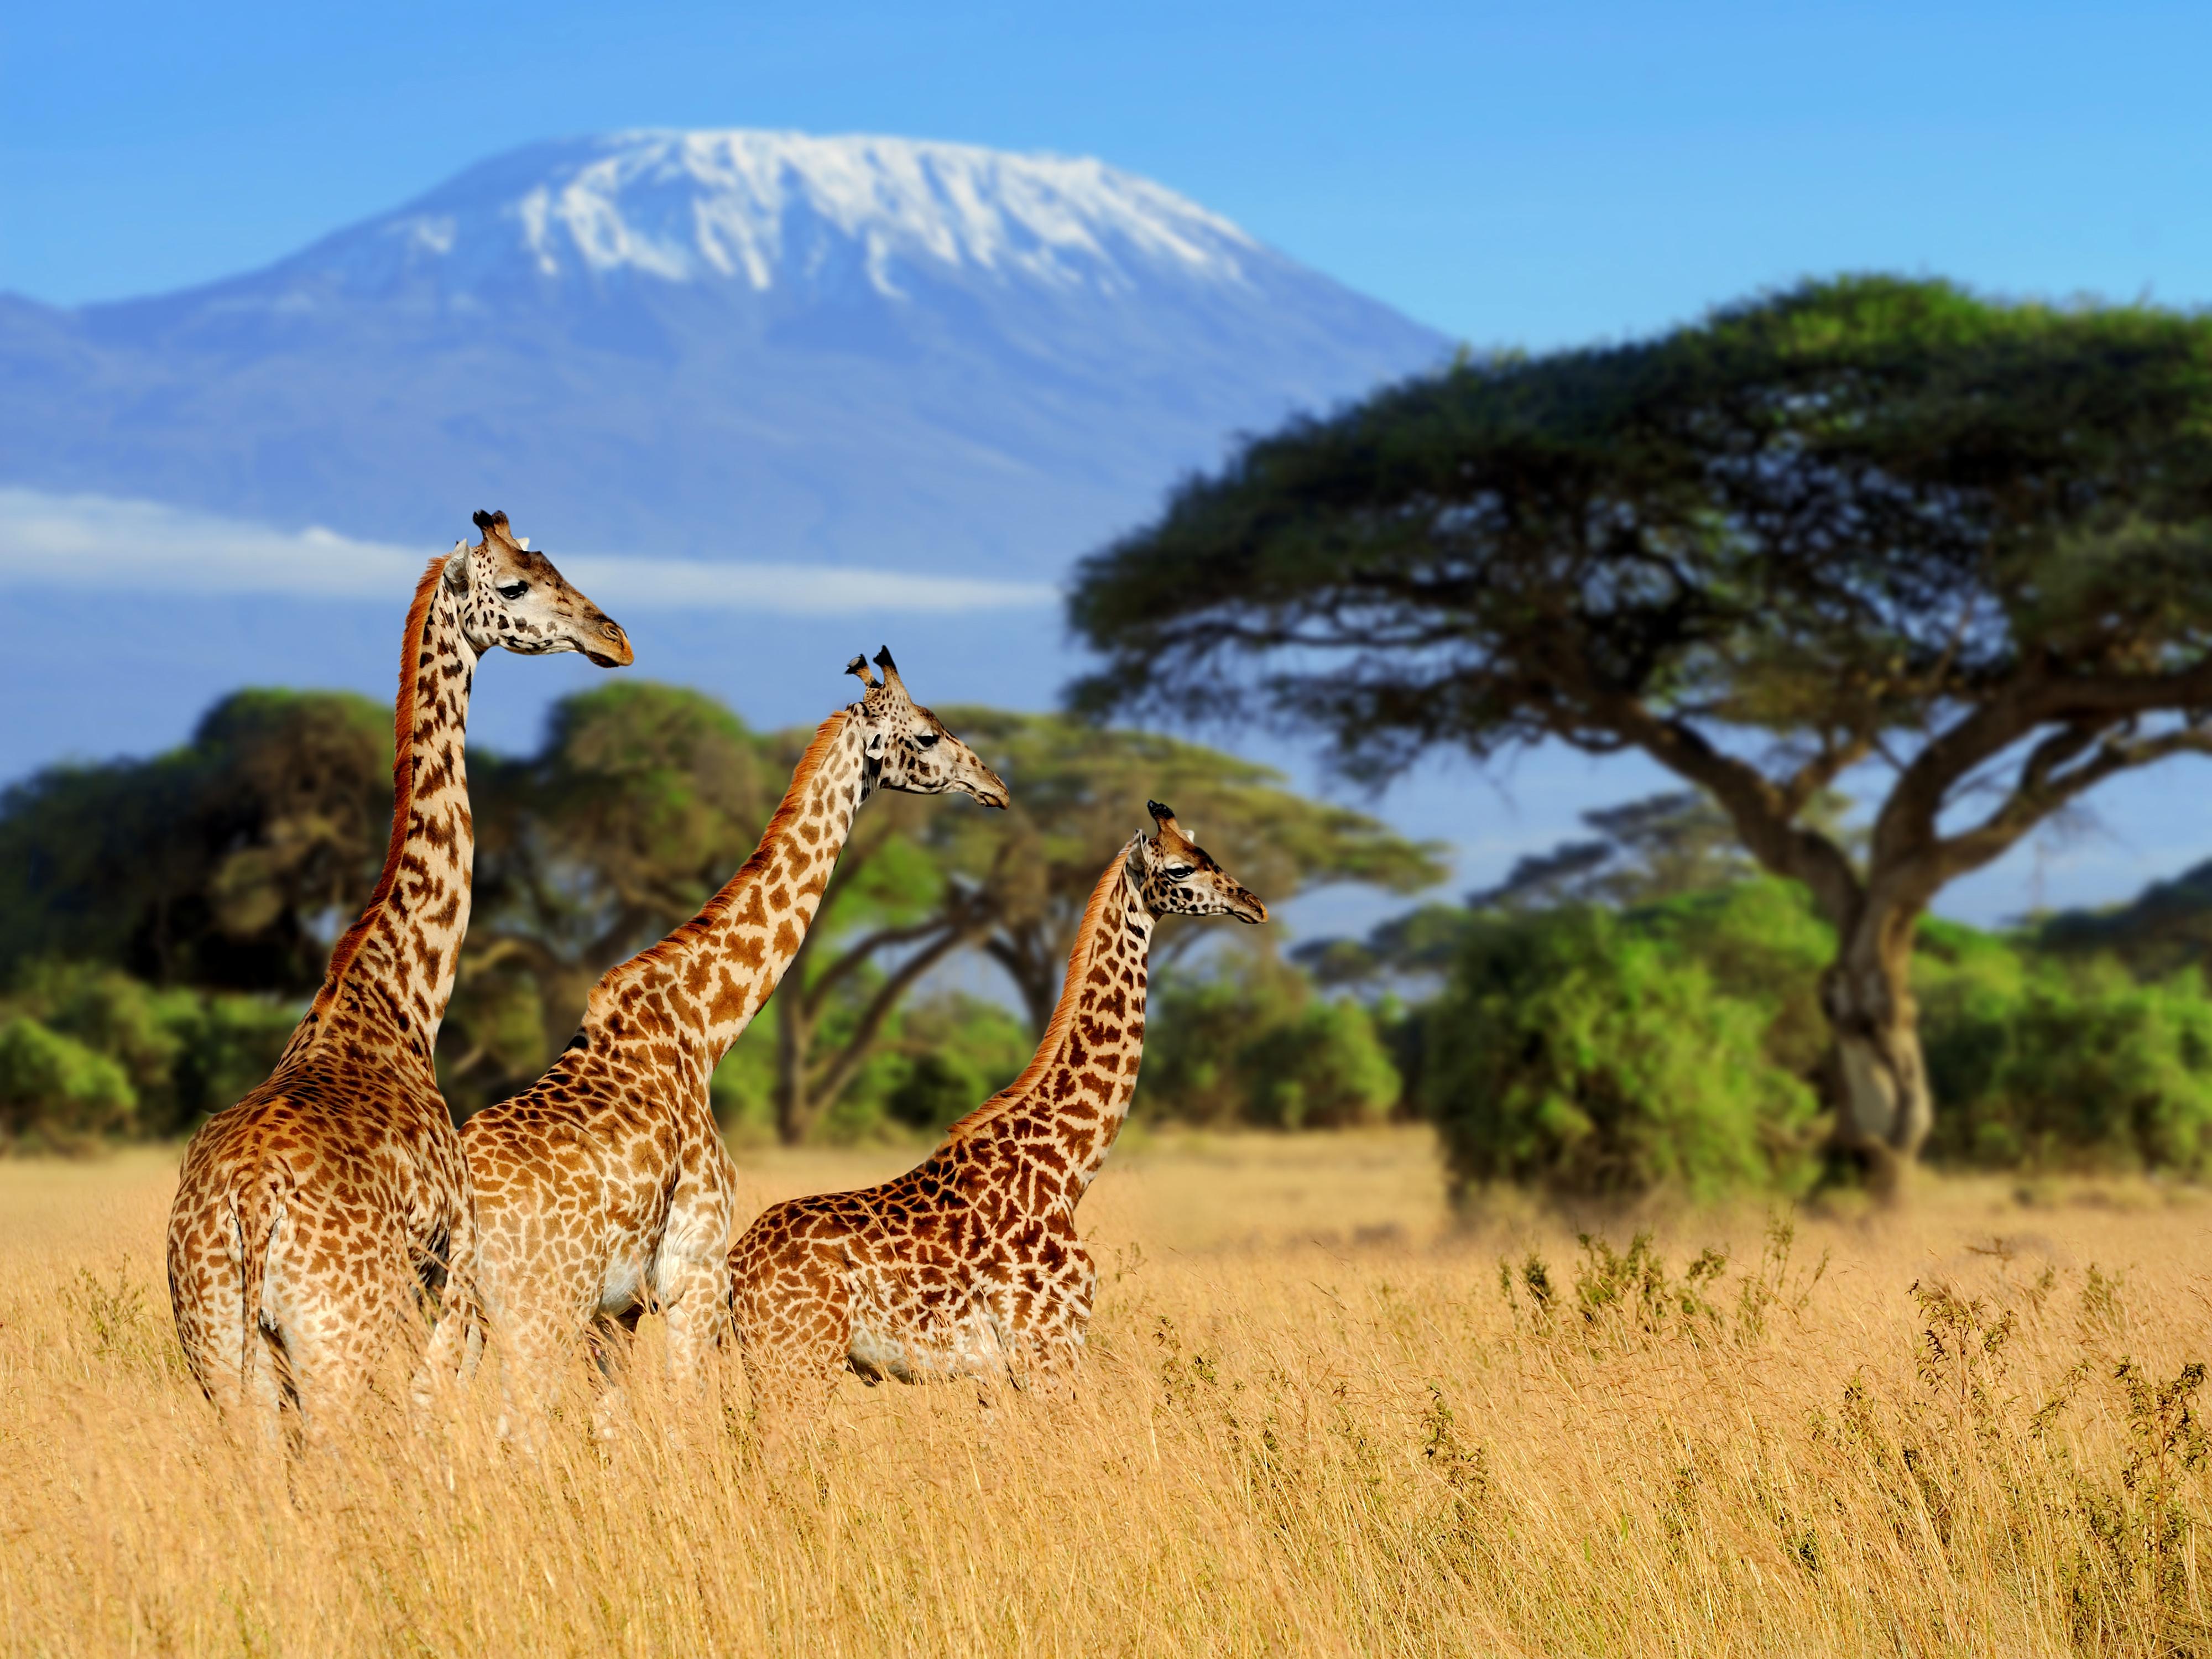 Three giraffe on Kilimanjaro mount backg